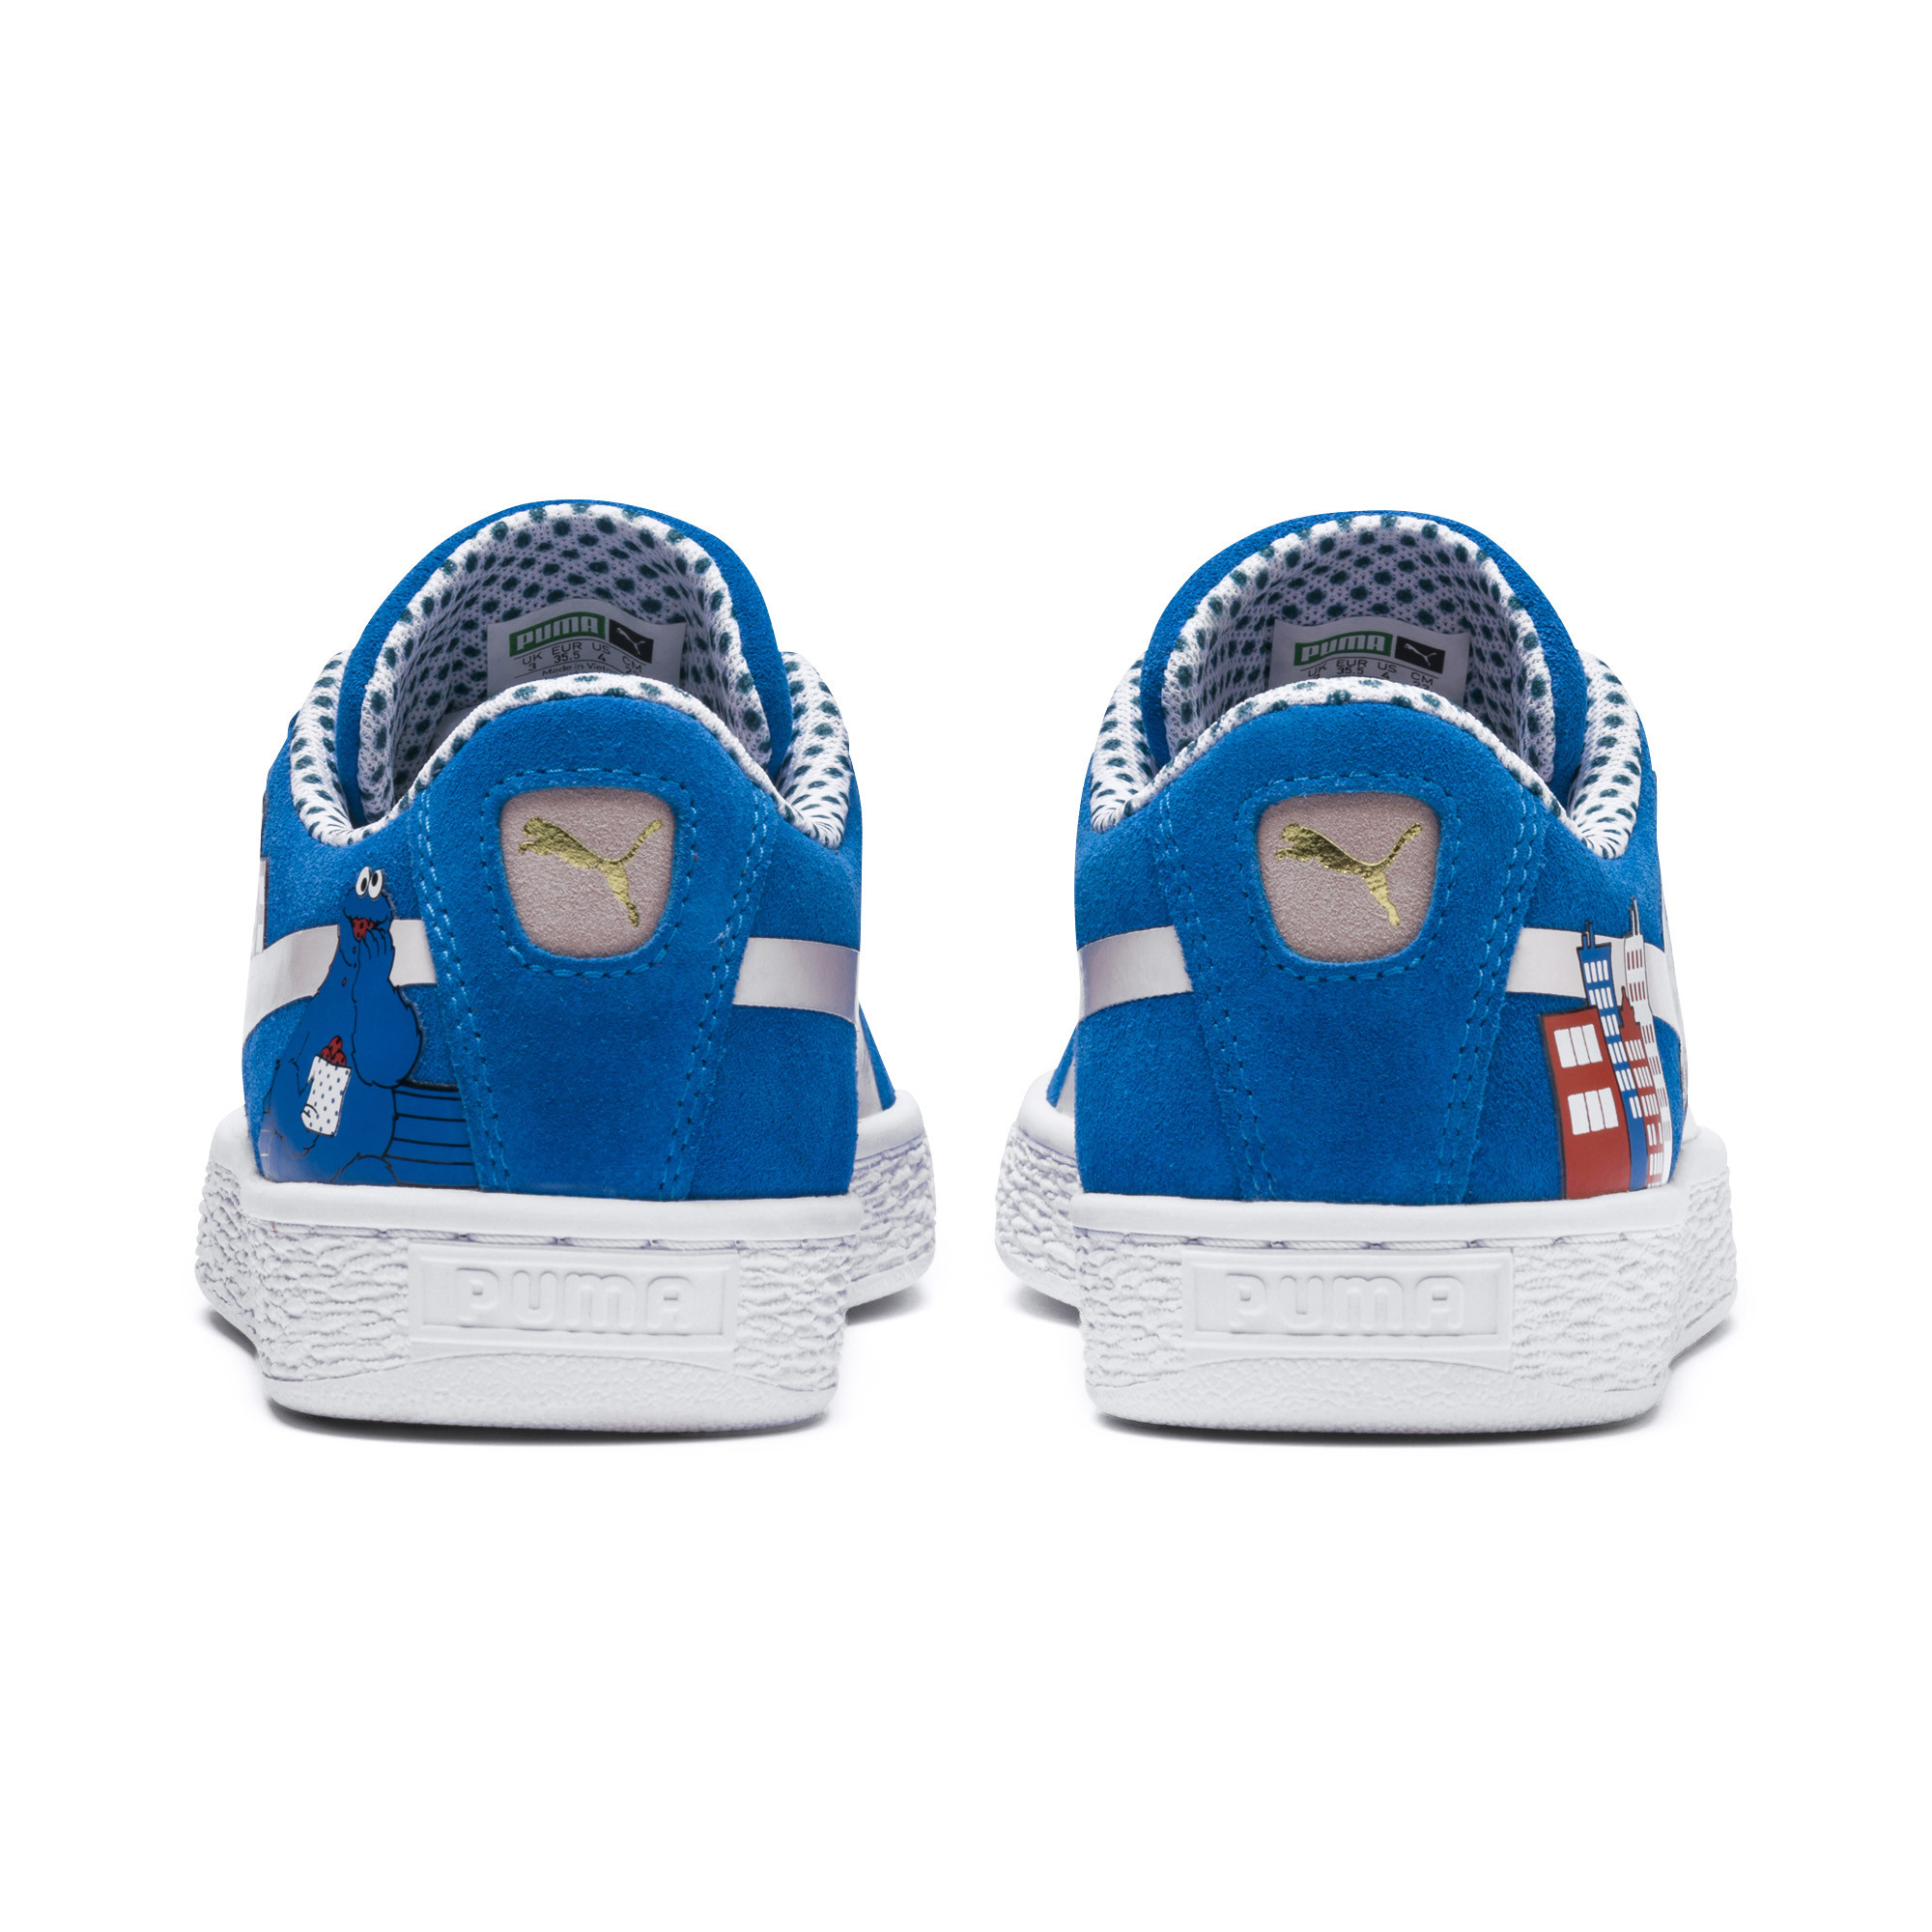 Zapatillas Suede Sesame Street preescolar